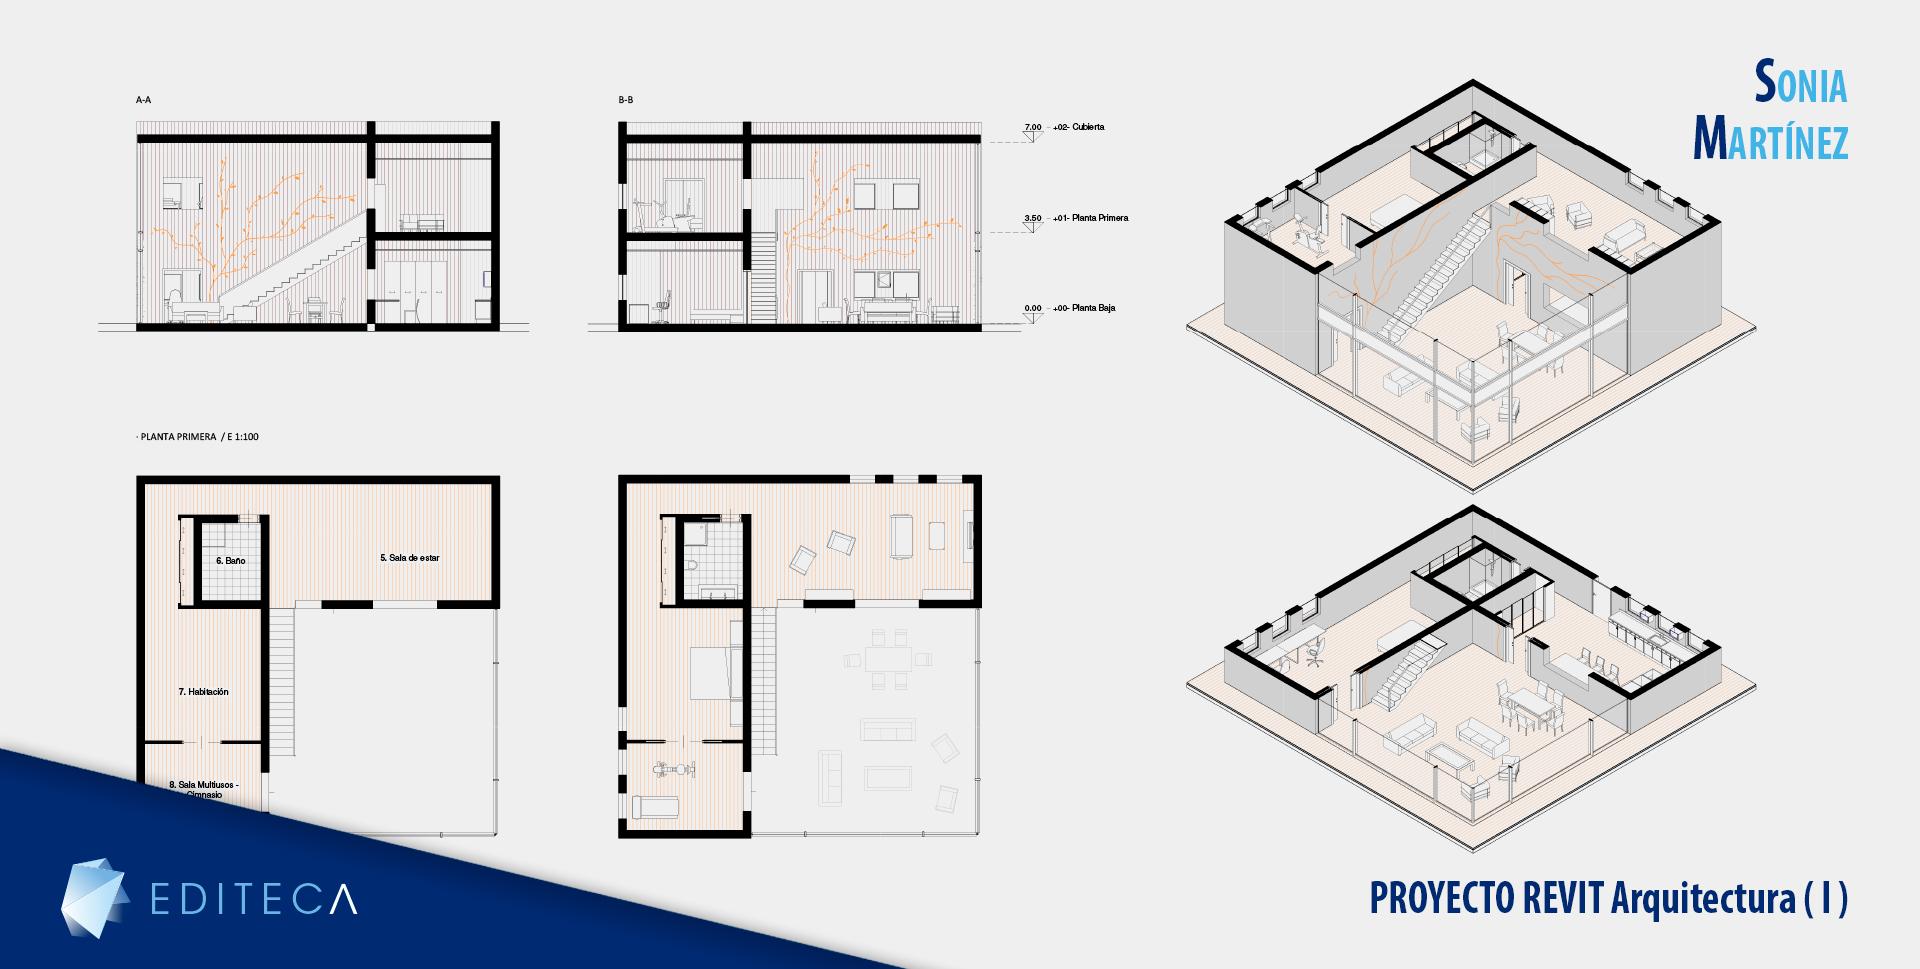 proyecto curso de revit arquitectura - Sonia